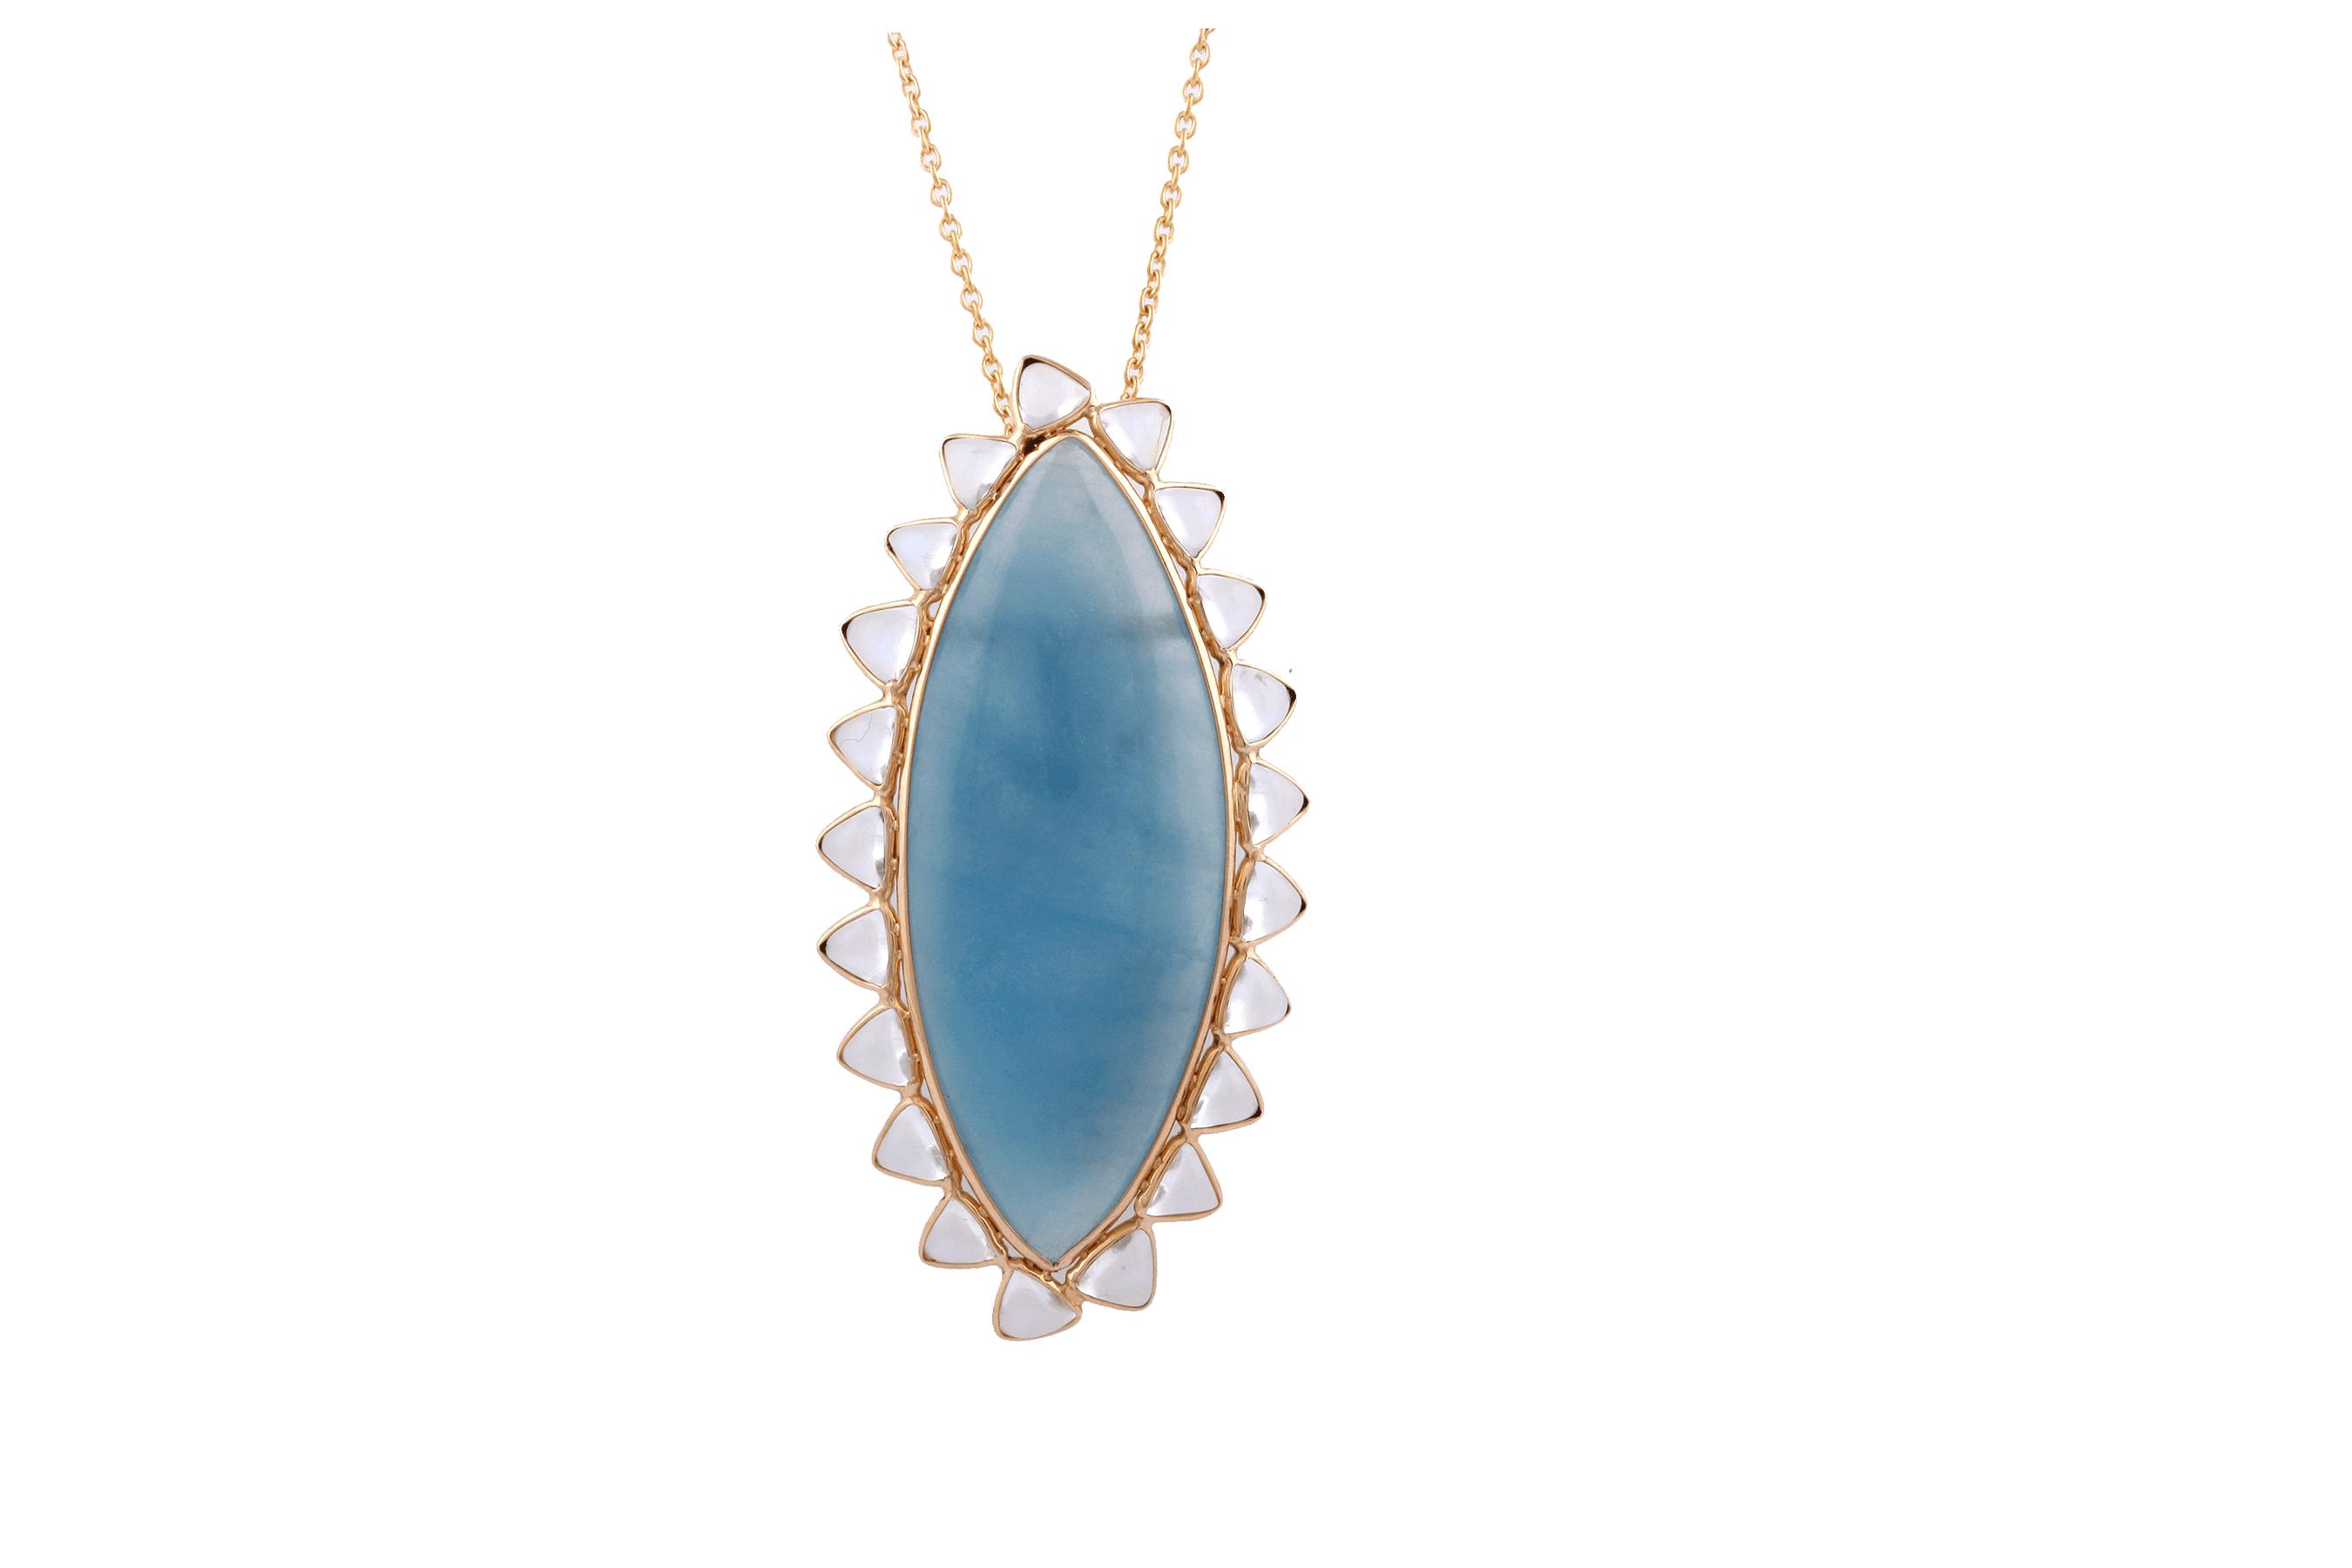 Tresor Collection - Aquamarine Mq. & Rainbow Moonstone Trilliant Pendant in 18k YG